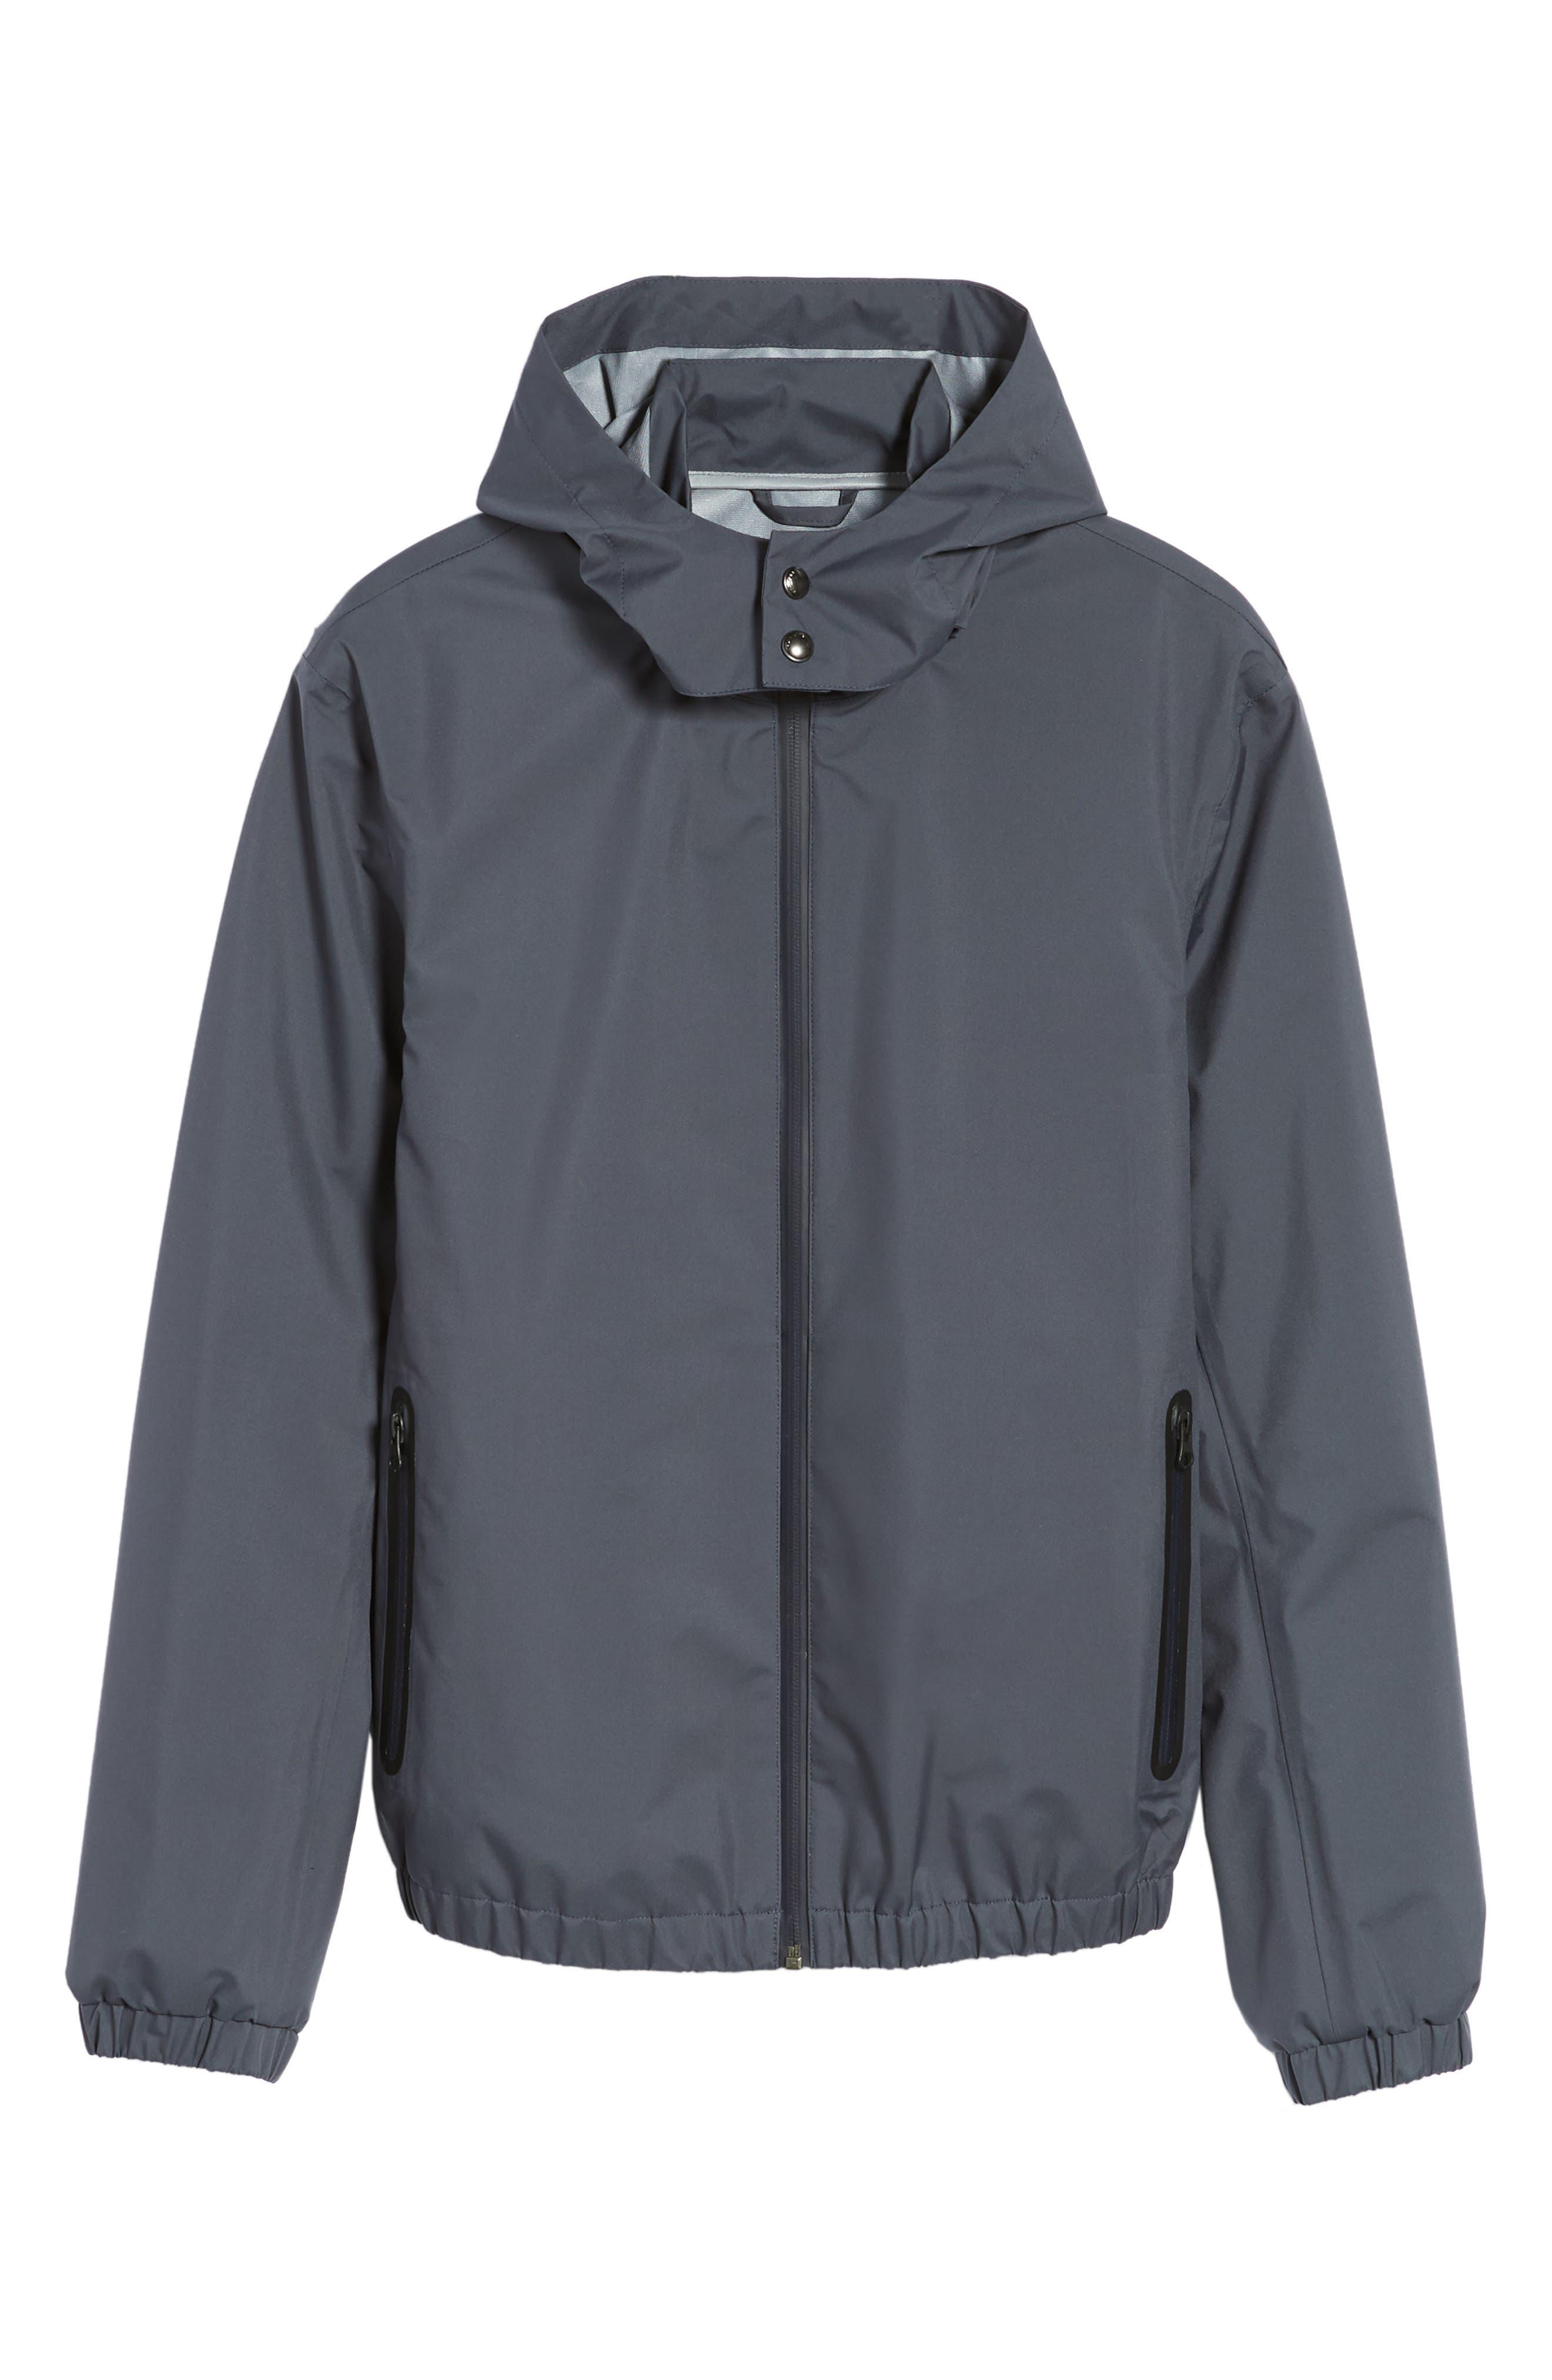 Regular Fit Jacket,                             Alternate thumbnail 6, color,                             Slate